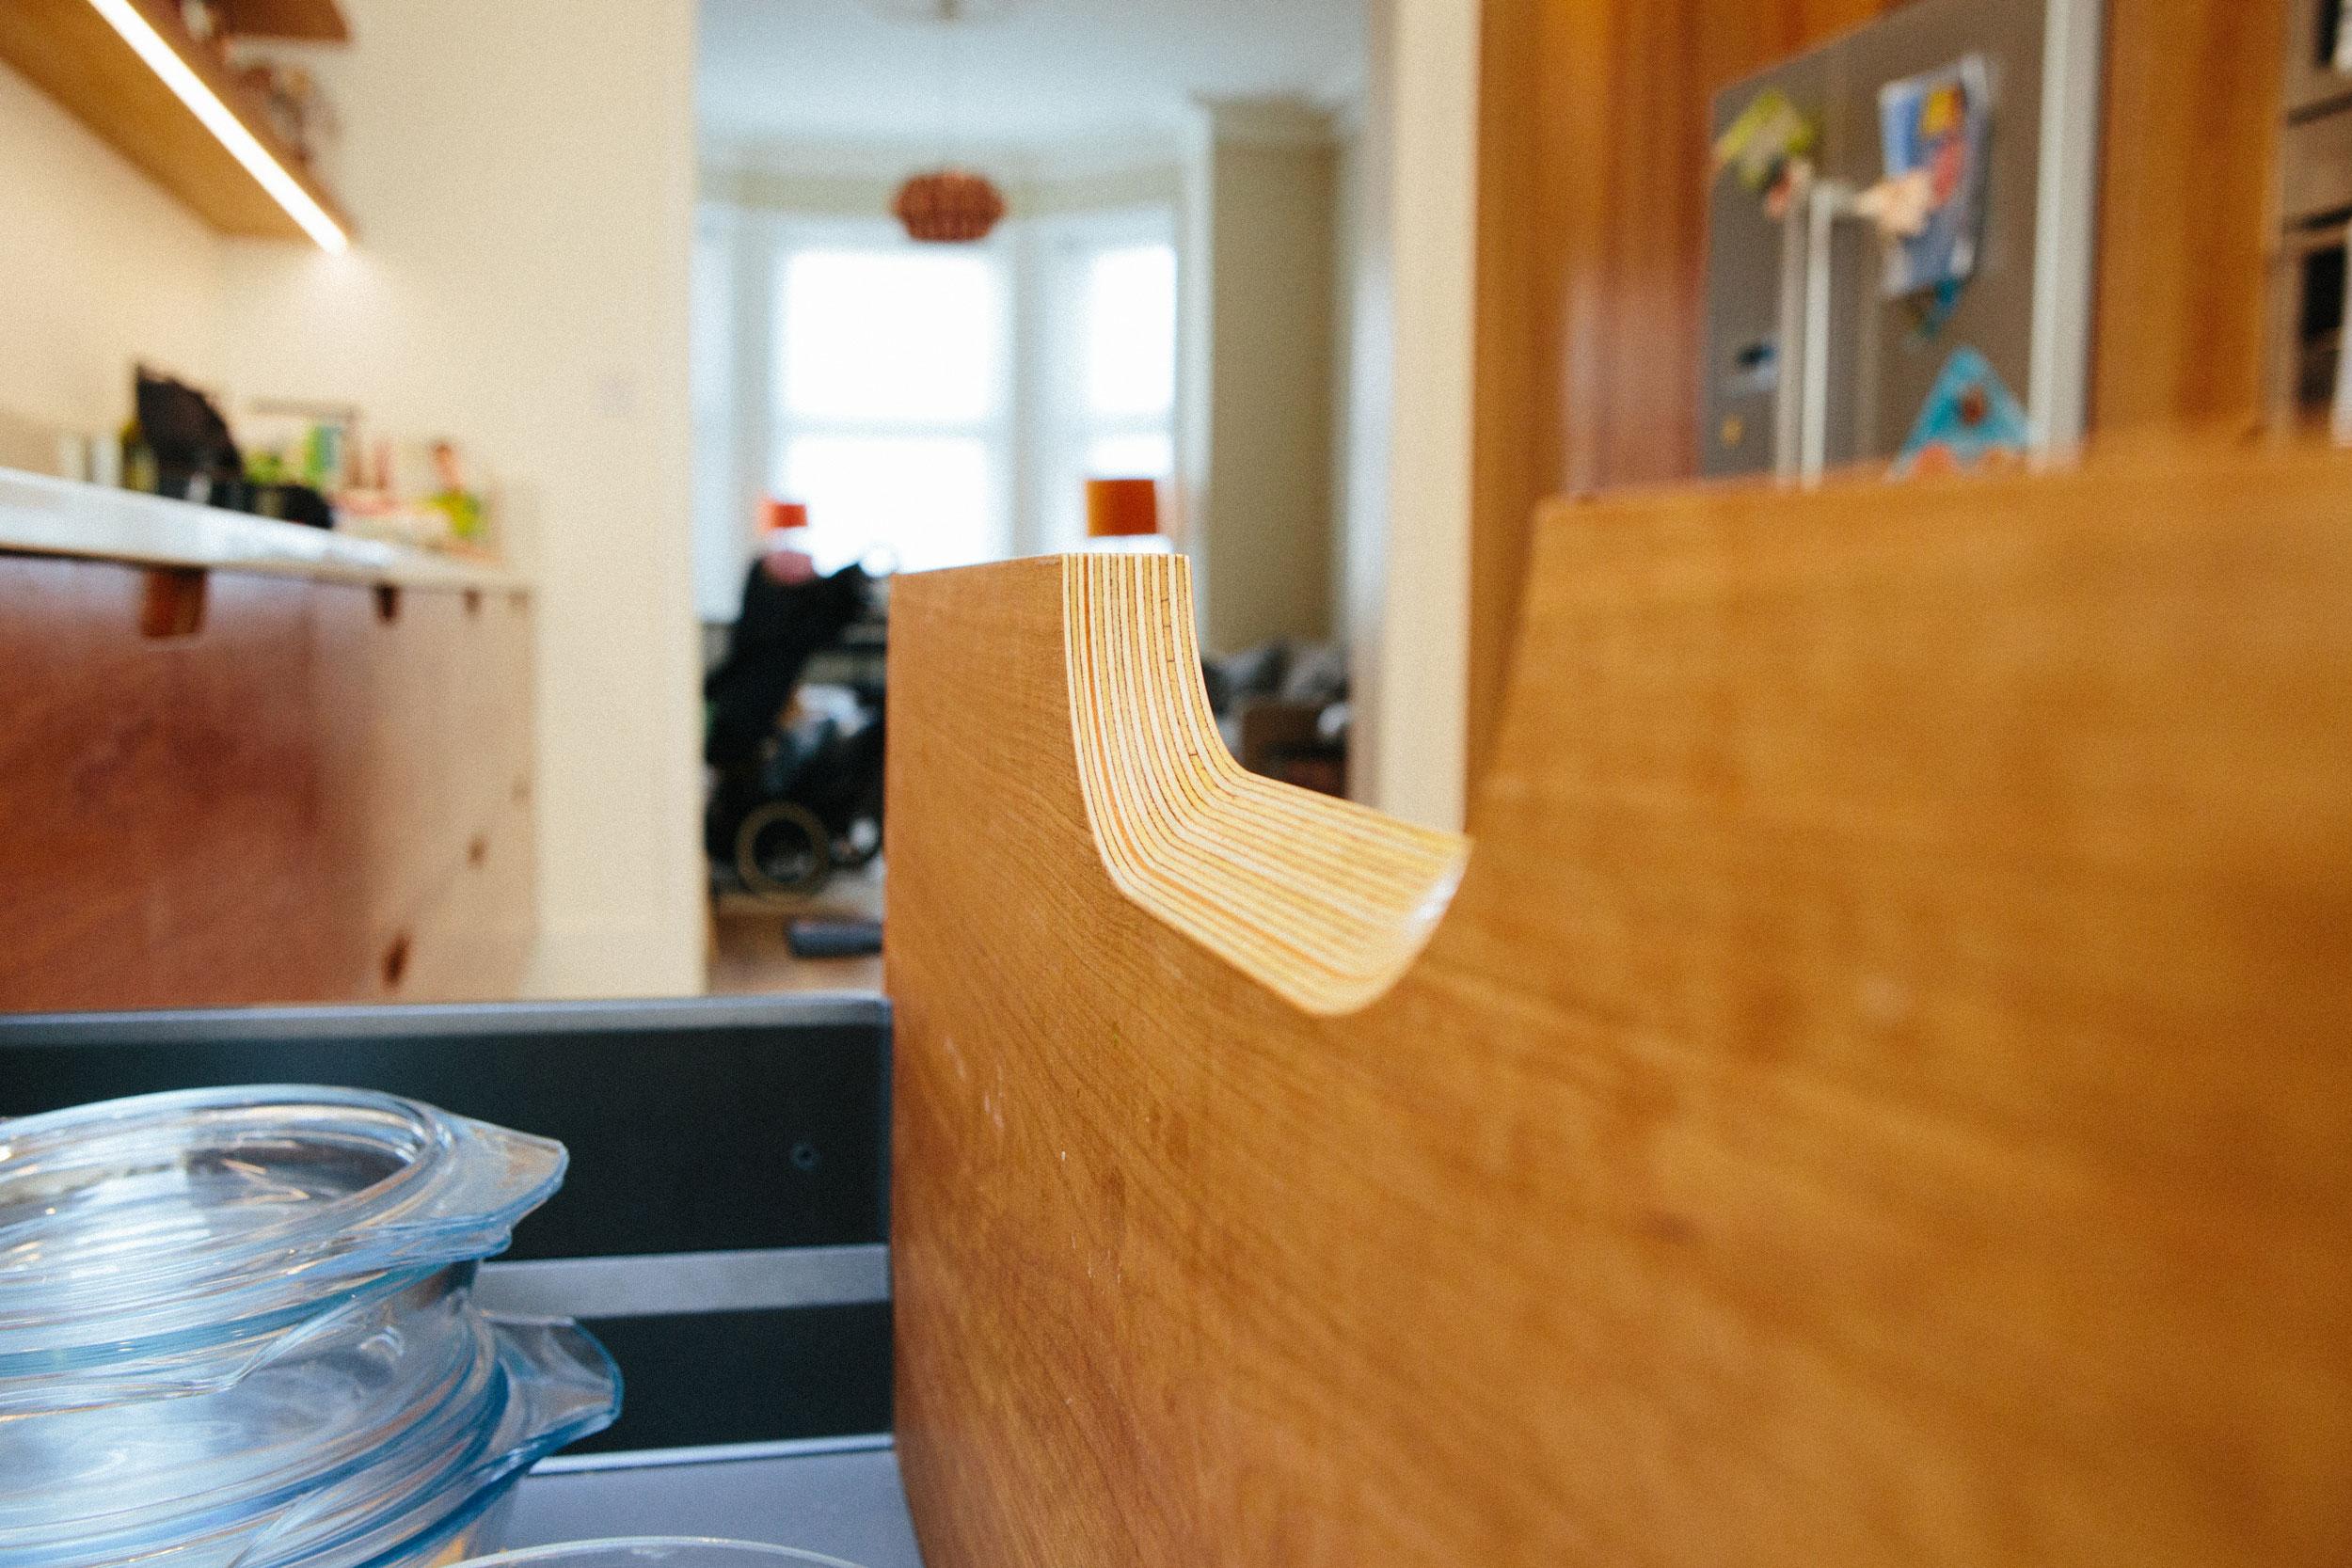 birch ply drawers, retro vintage design, scandinavian